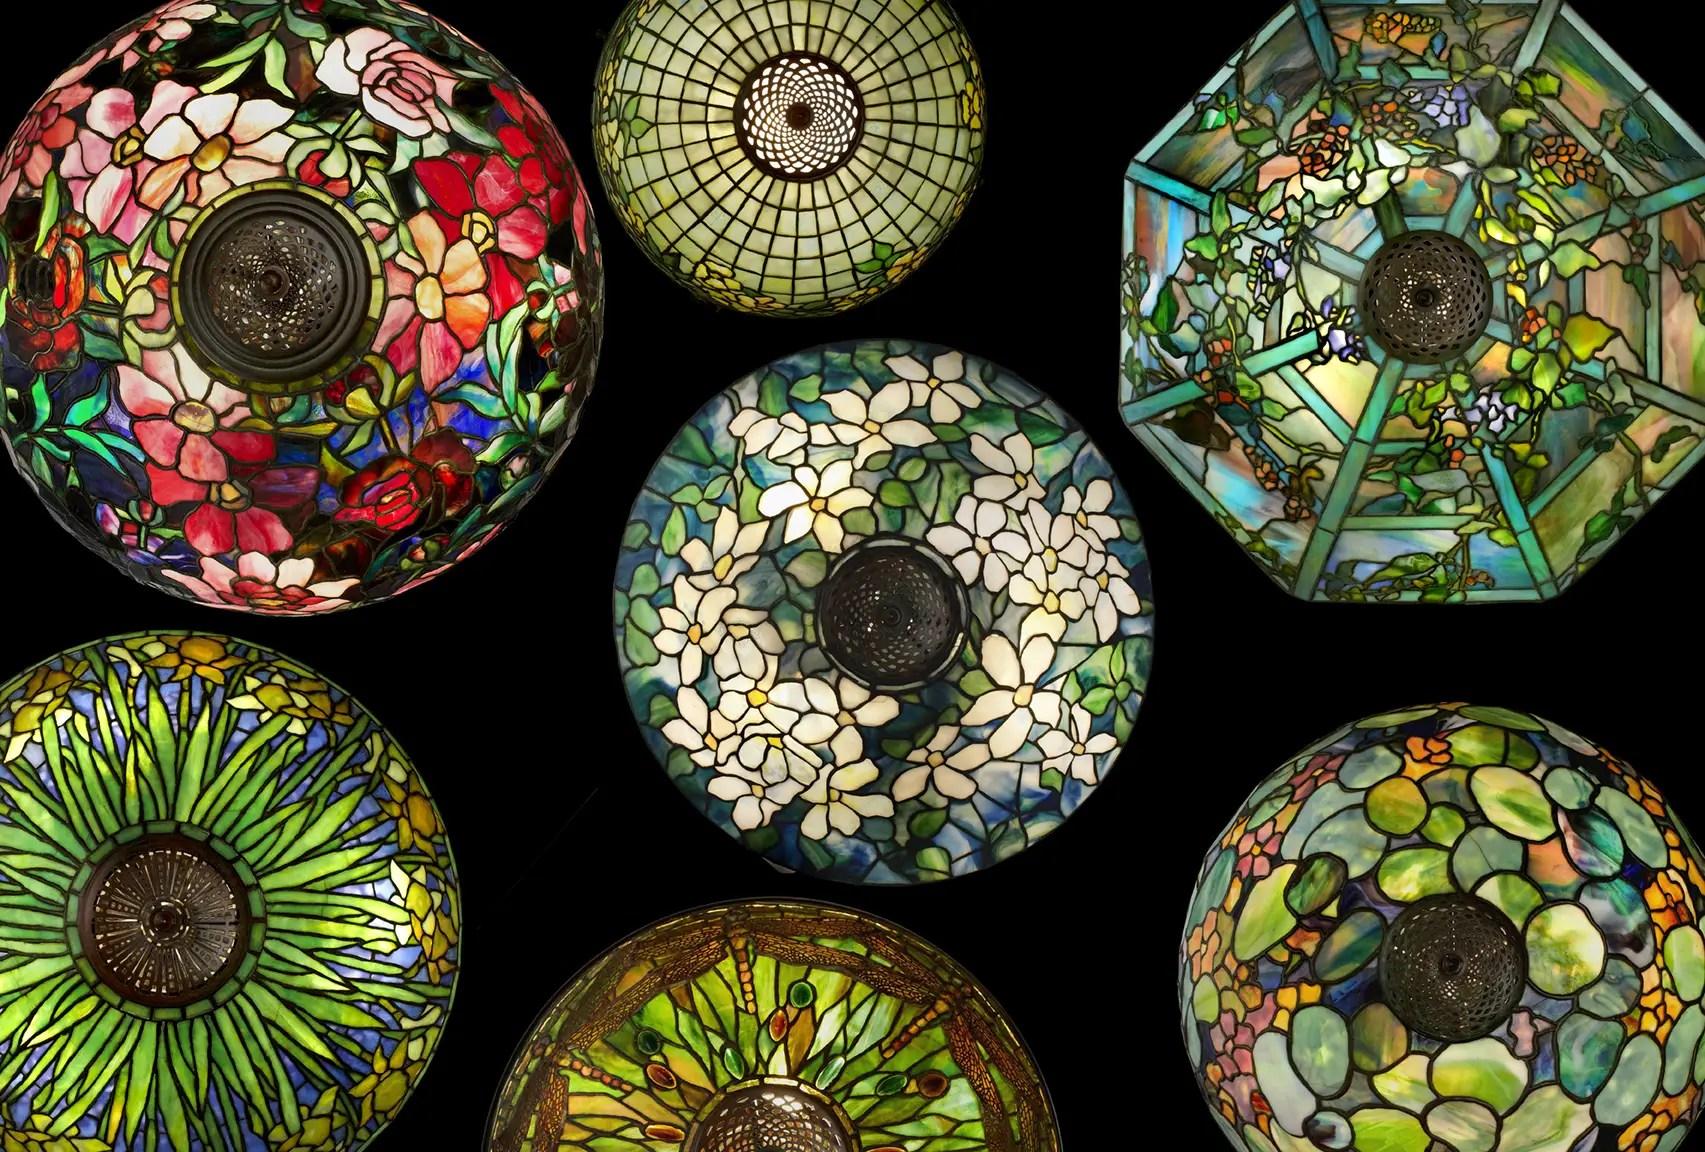 Tiffany Studios, Group Of Lamps (birdu0027s Eye Detail), Photograph By John  Faier, © Driehaus Museum, 2013